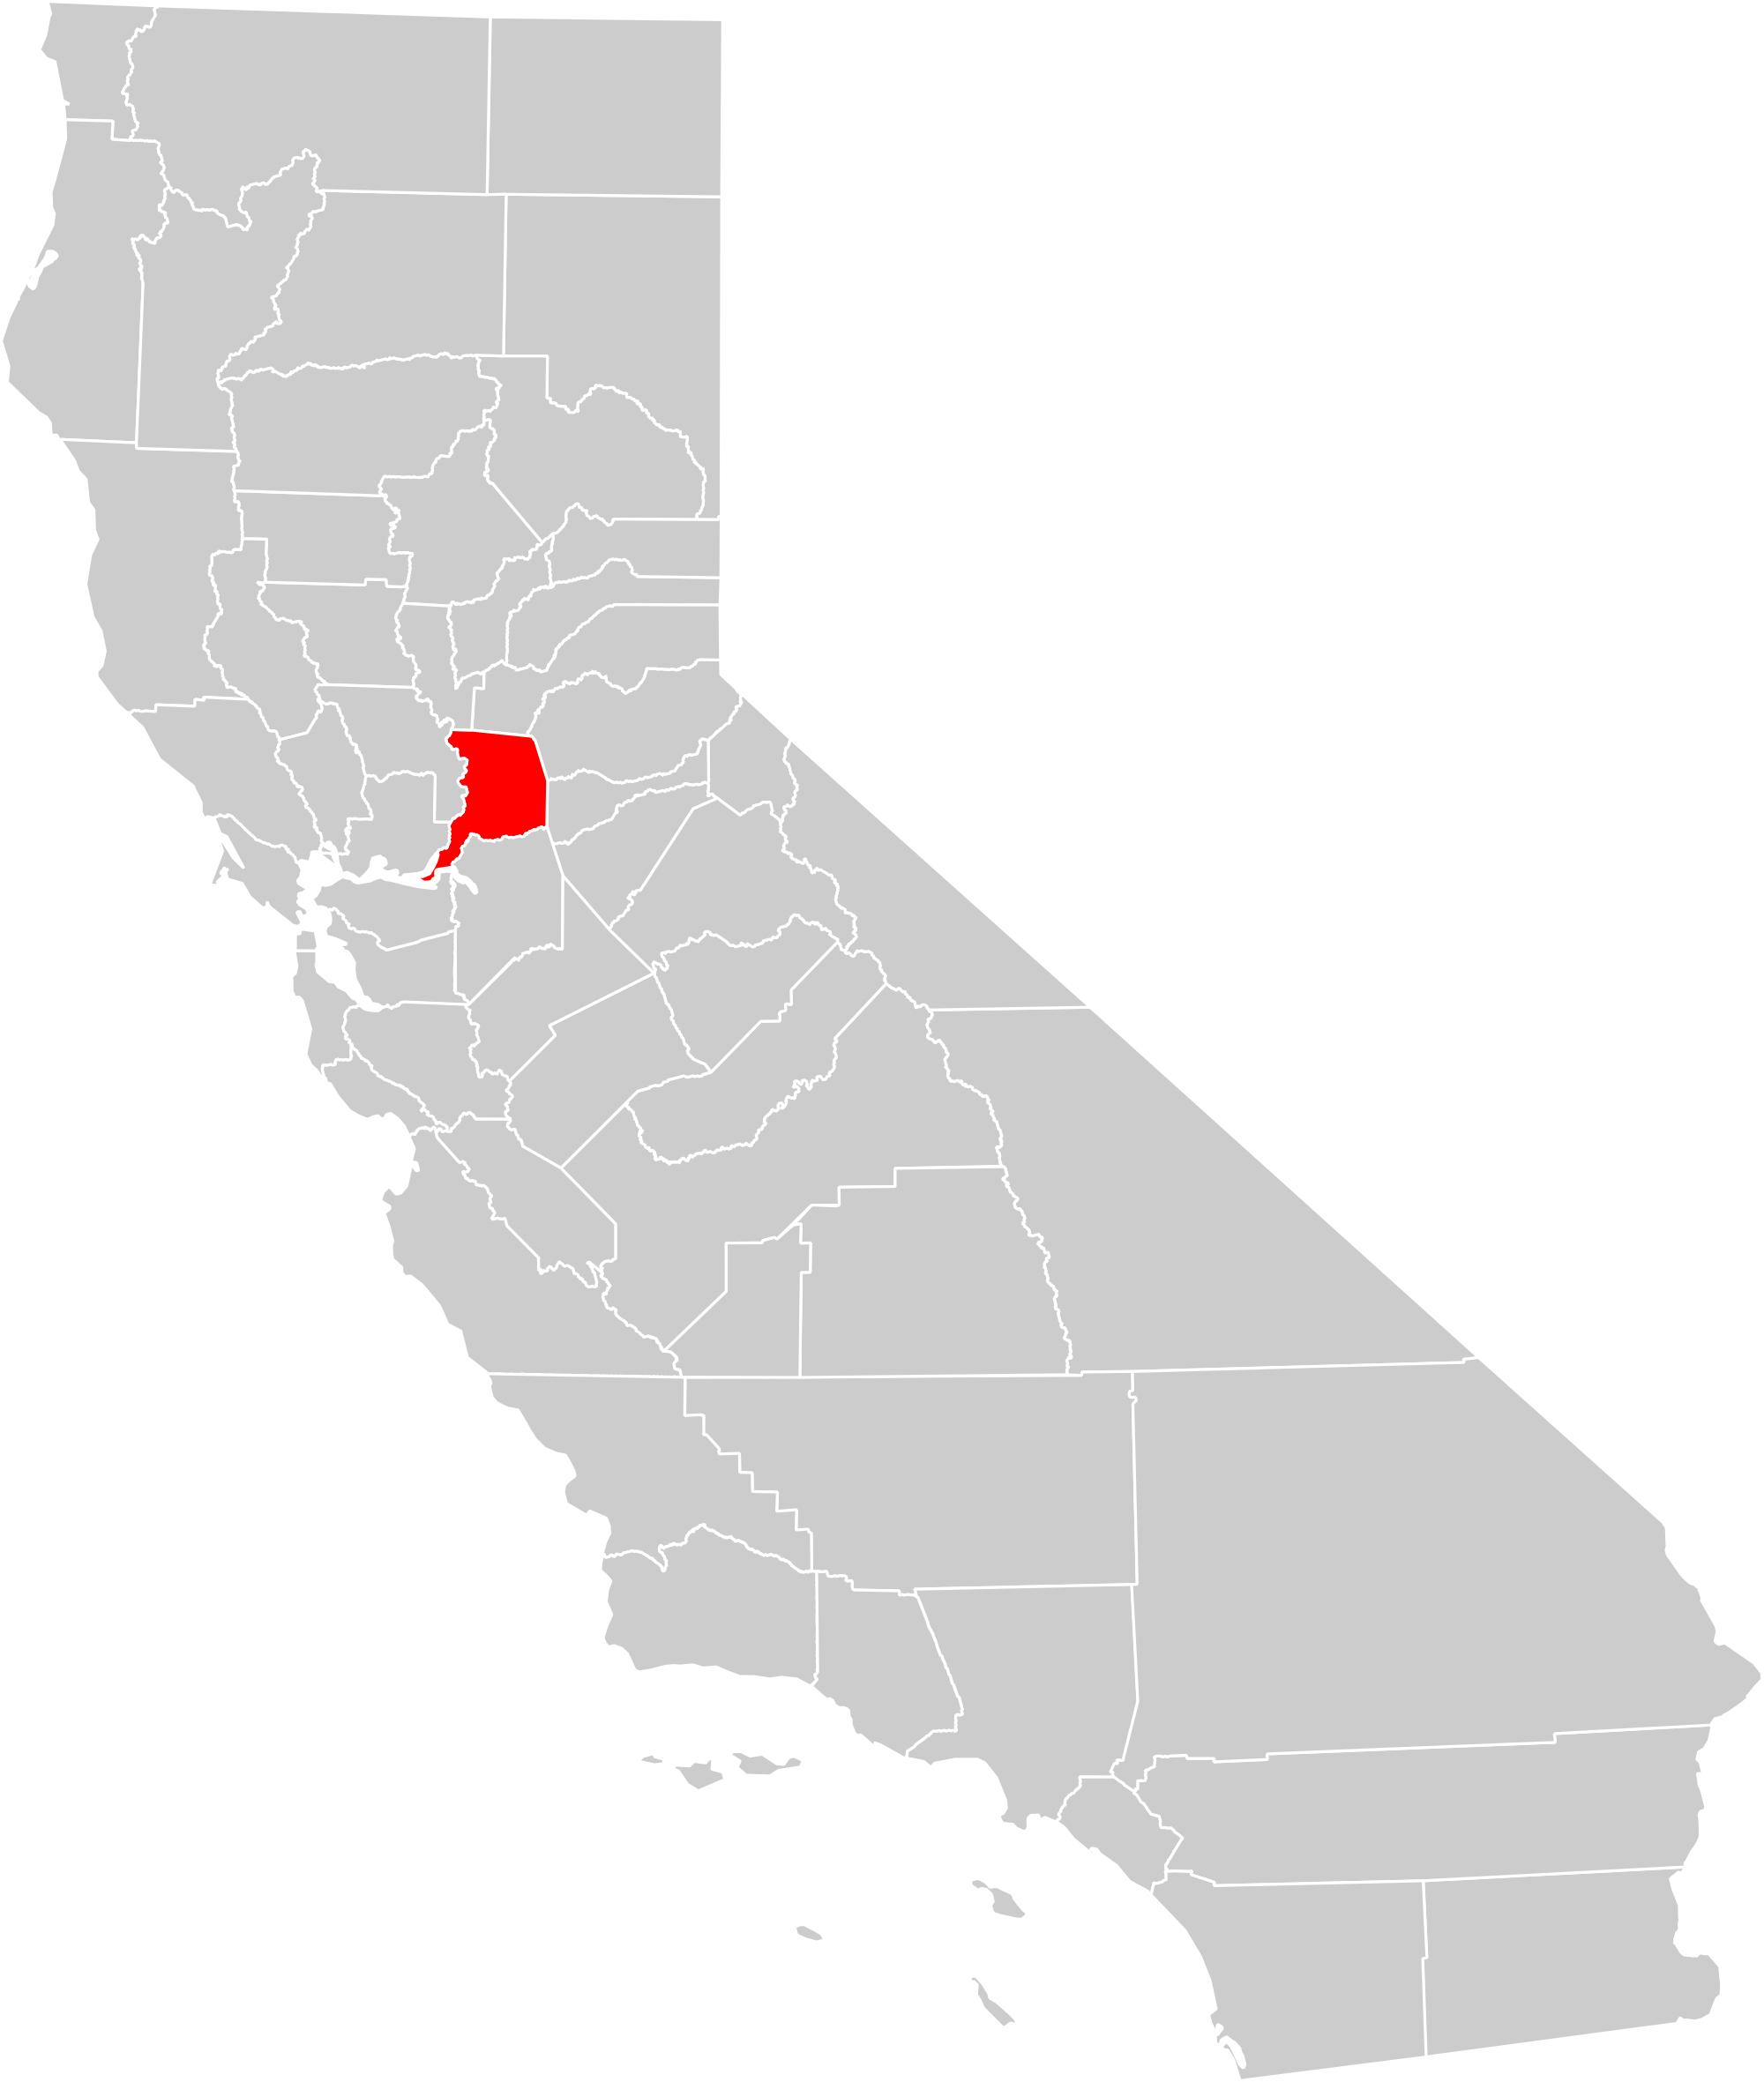 Where Is Sacramento California On The Map - Klipy - Where Is Sacramento California On A Map